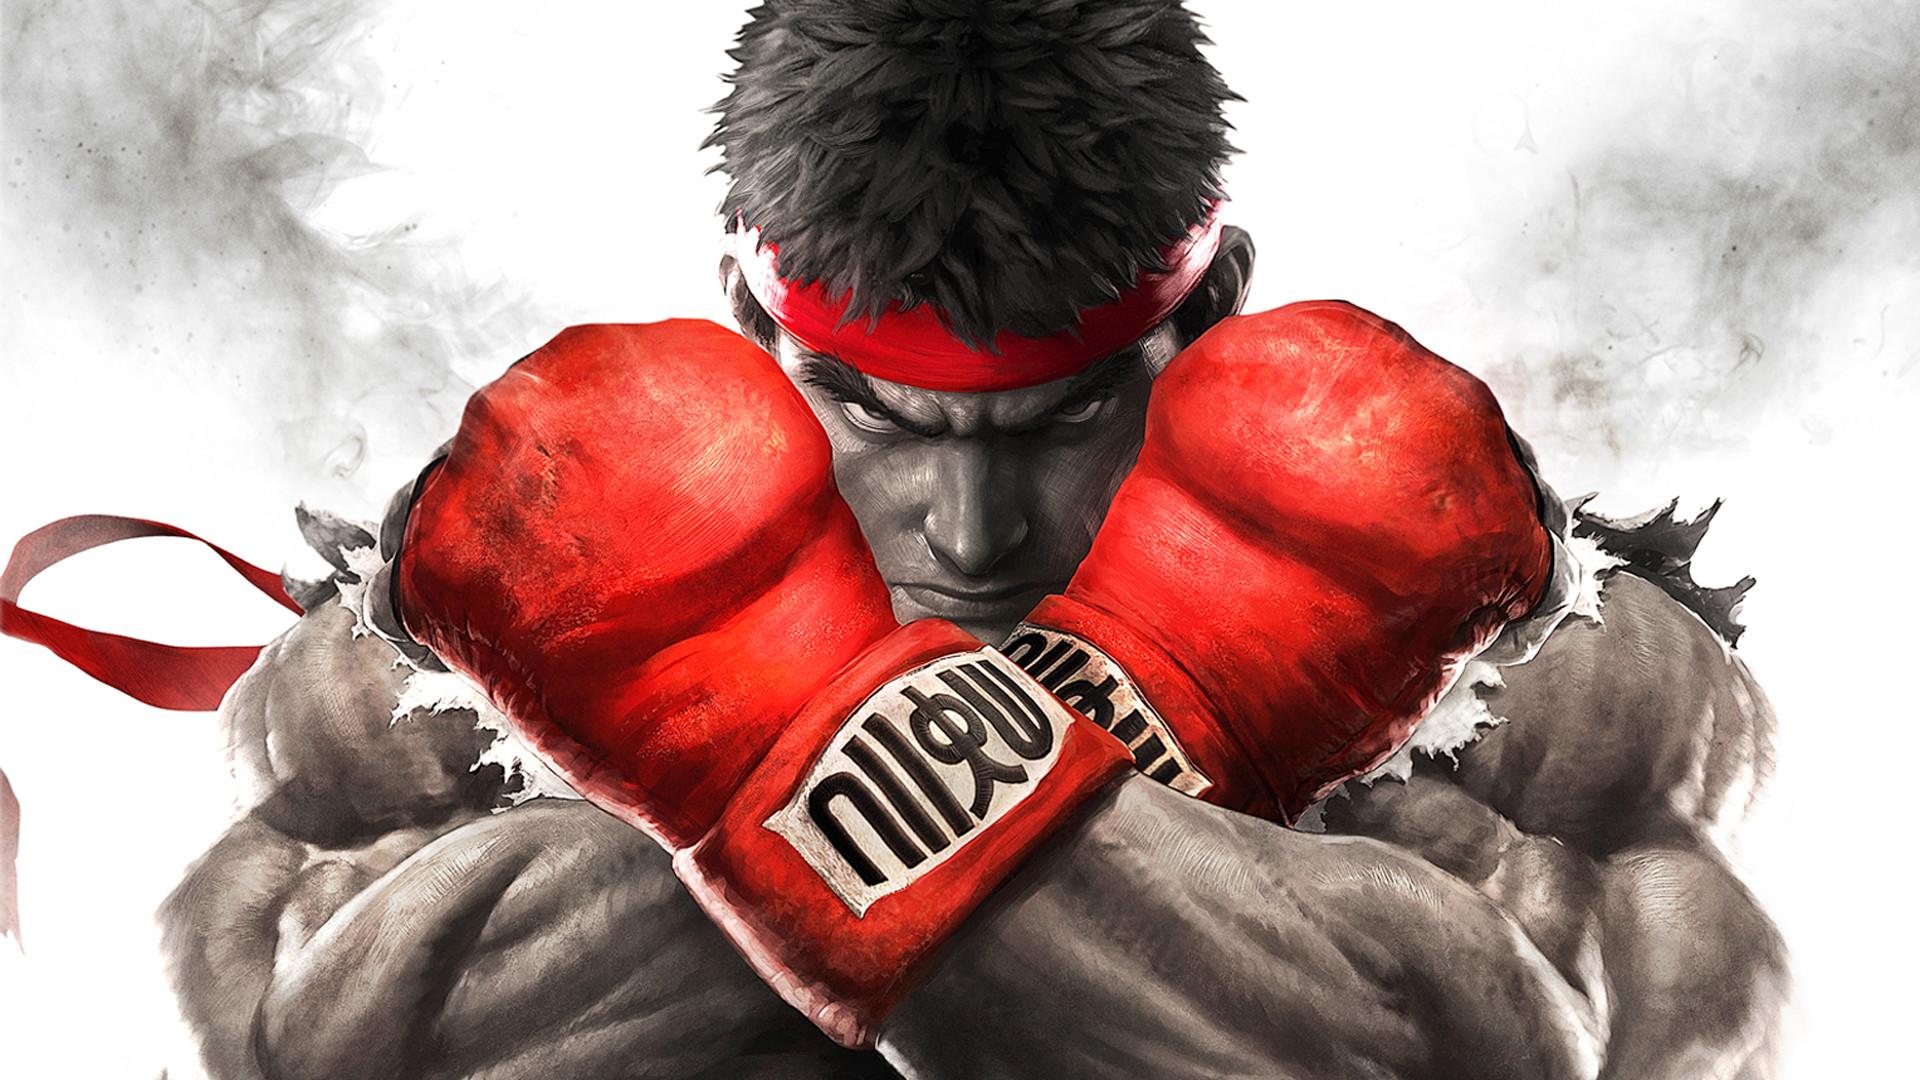 … Street Fighter V Wallpaper 1 by SONICX2011